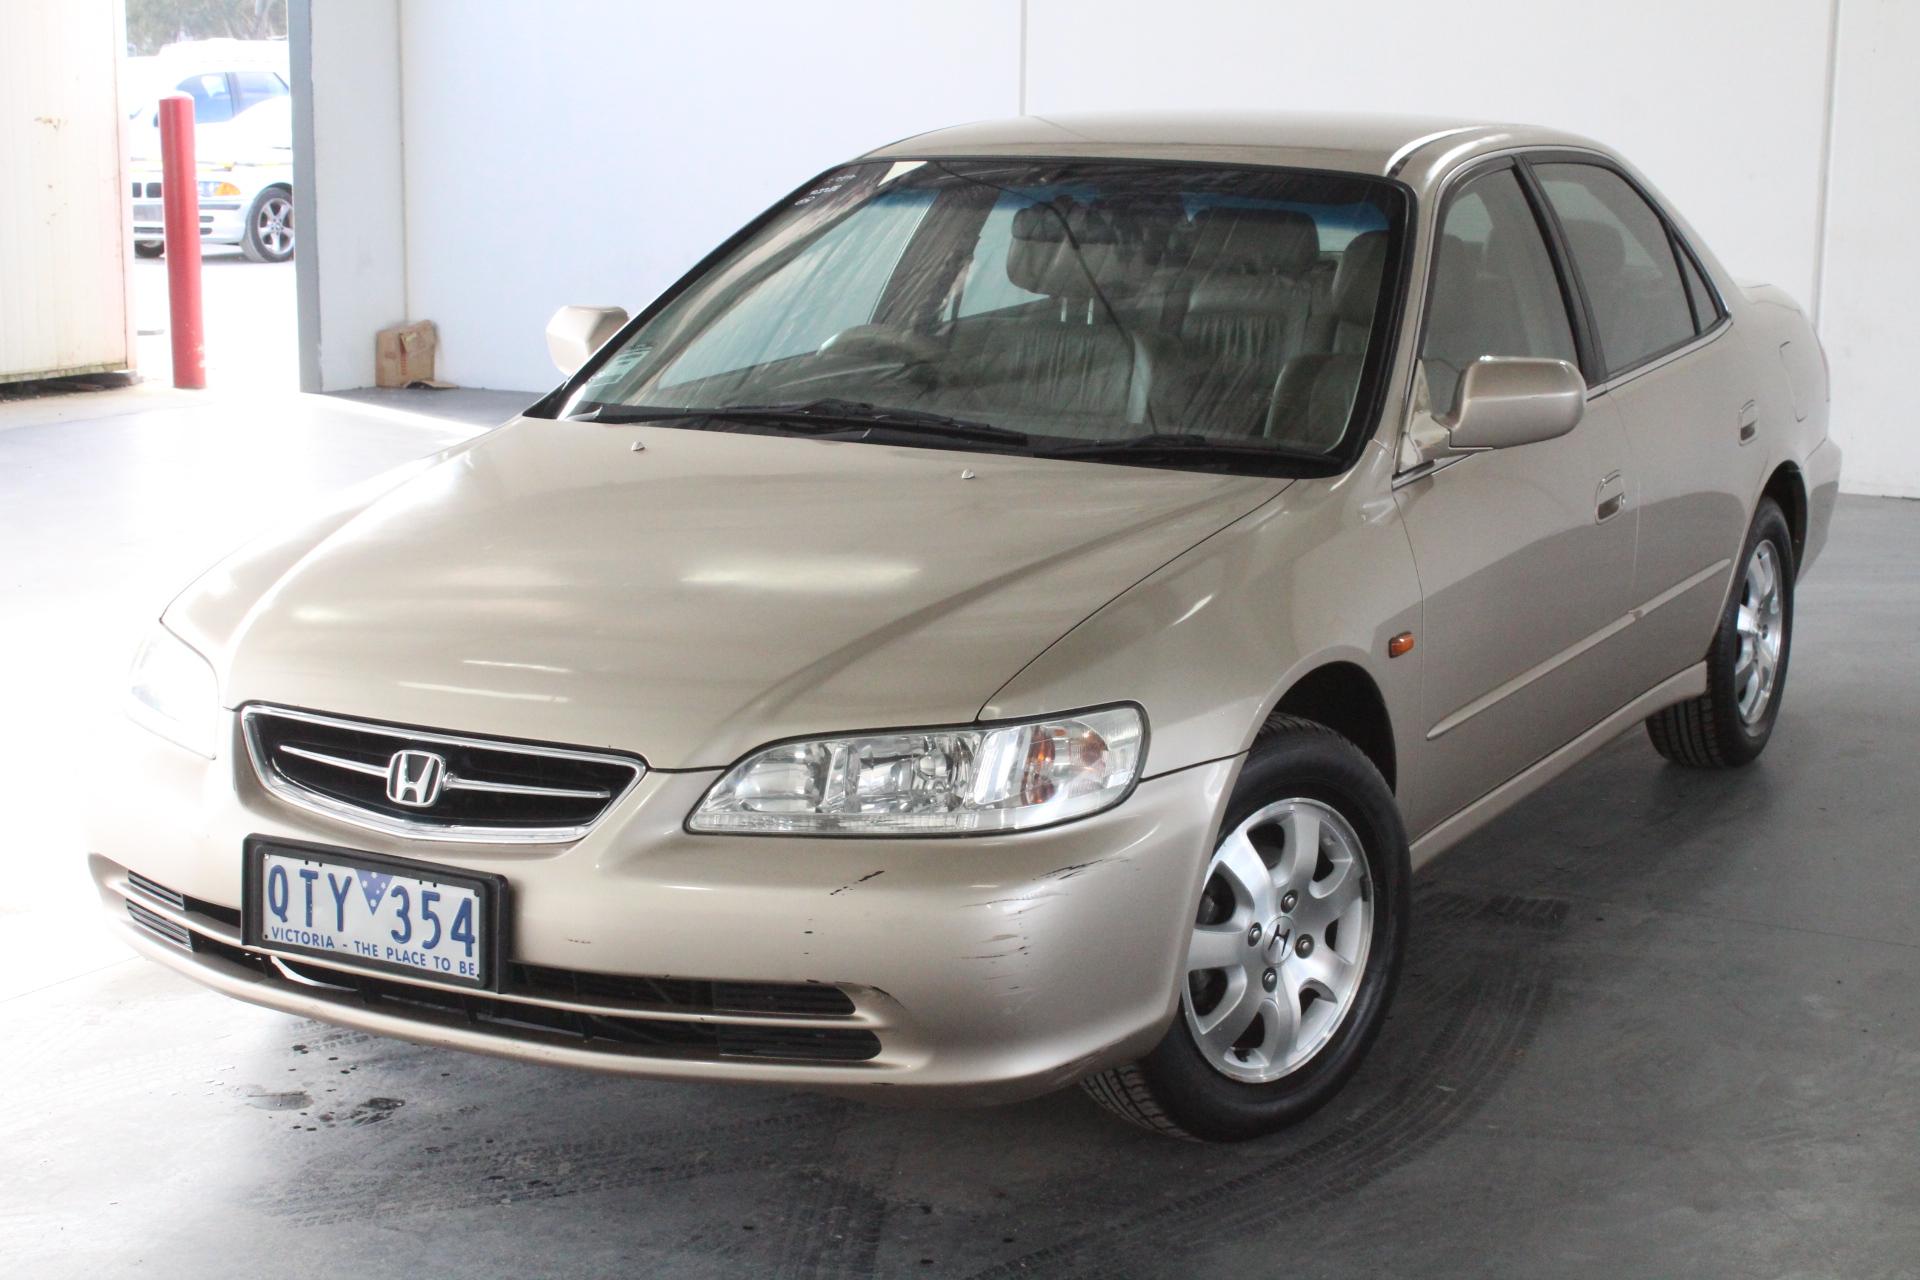 2001 Honda Accord VTi-L 6th Gen Automatic Sedan